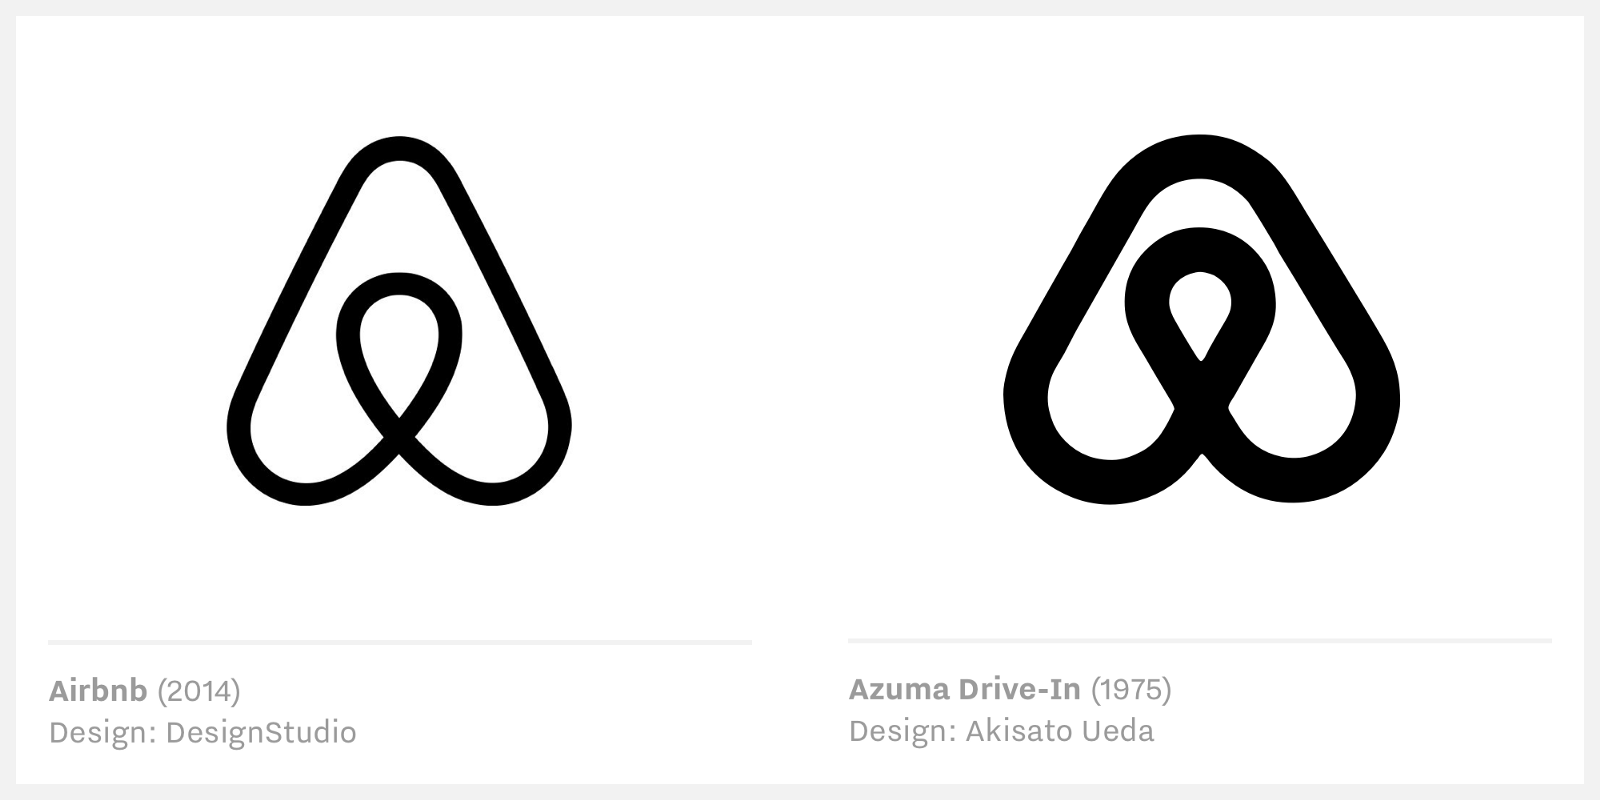 Airbnb vs Azuma Drive-In